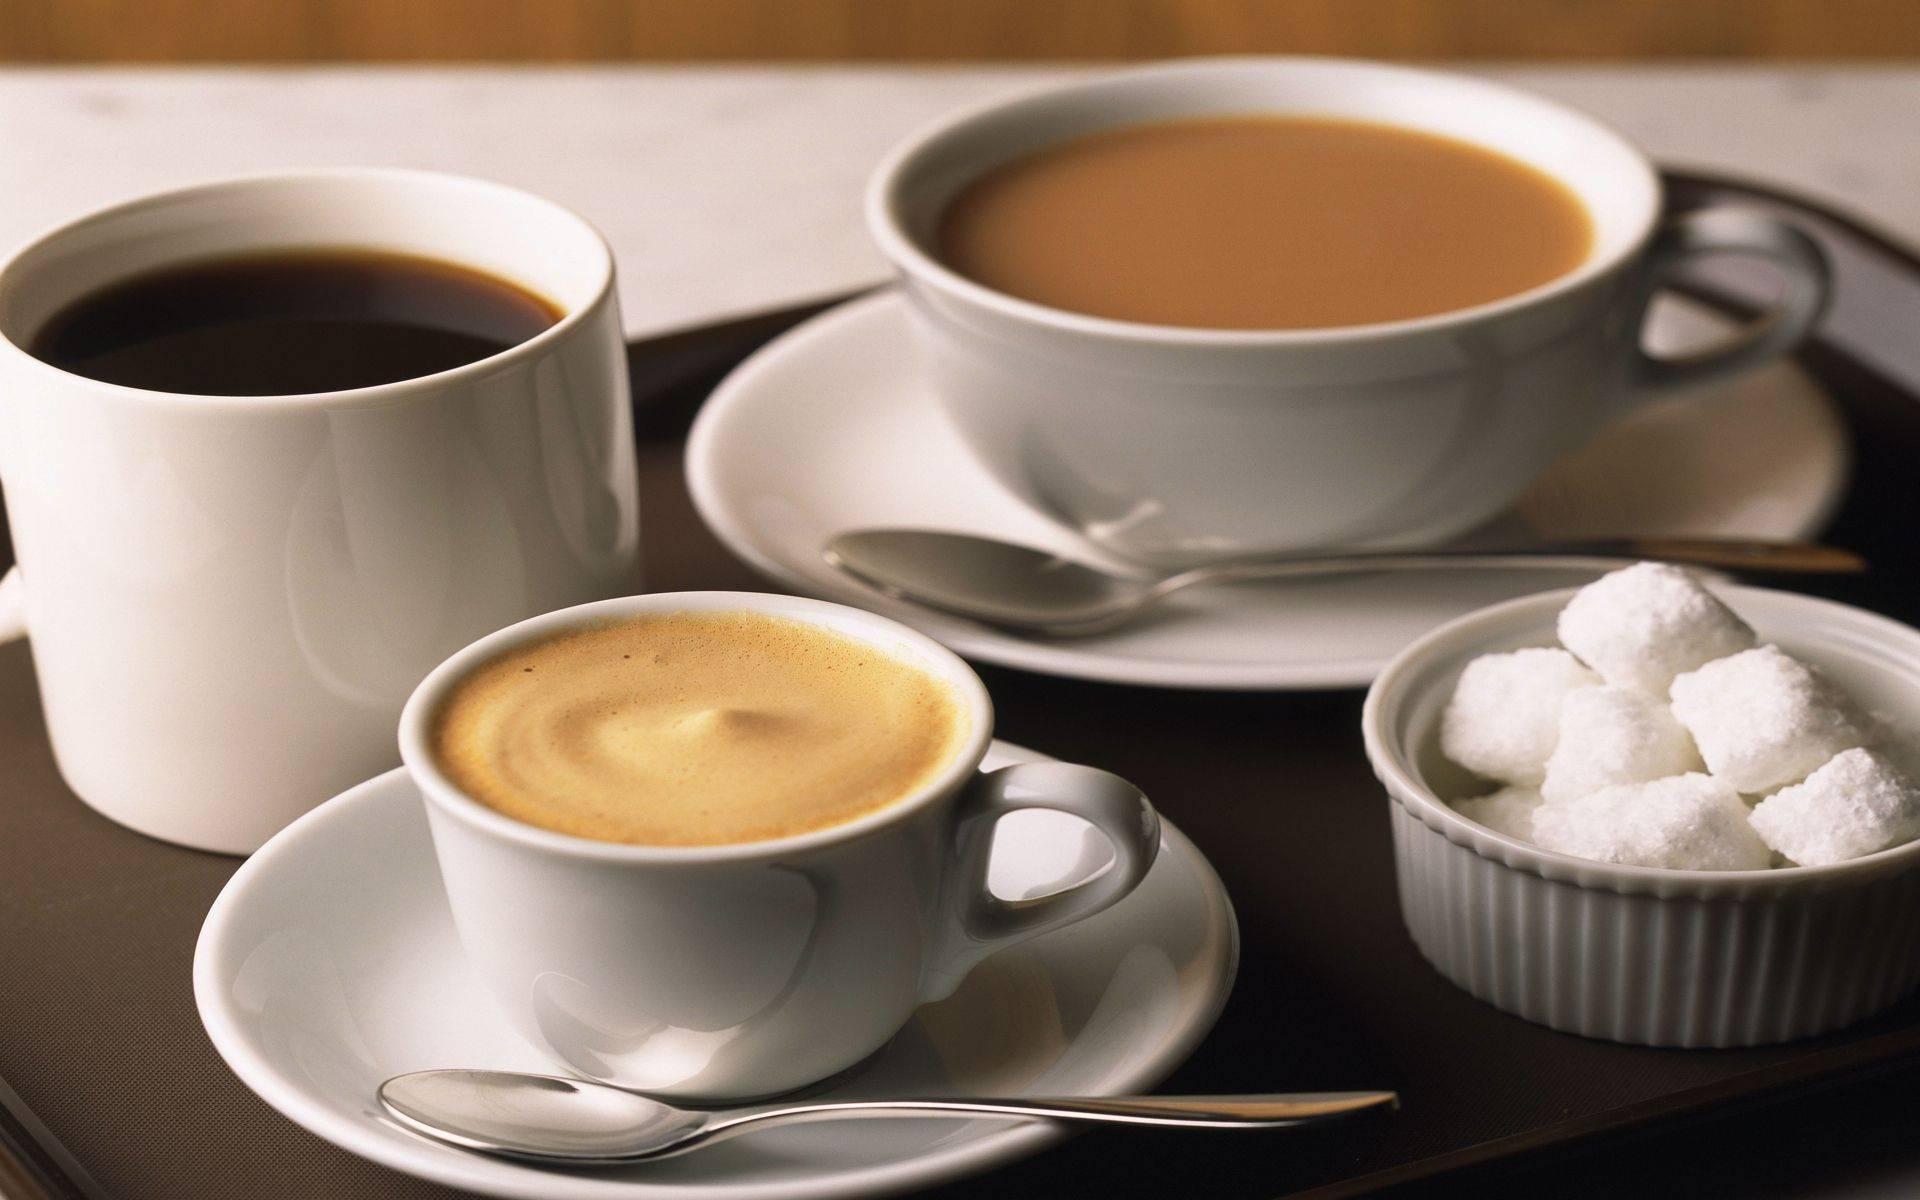 Wallpaper tags Food drink drink liquid cup mug spoon coffee 1920x1200